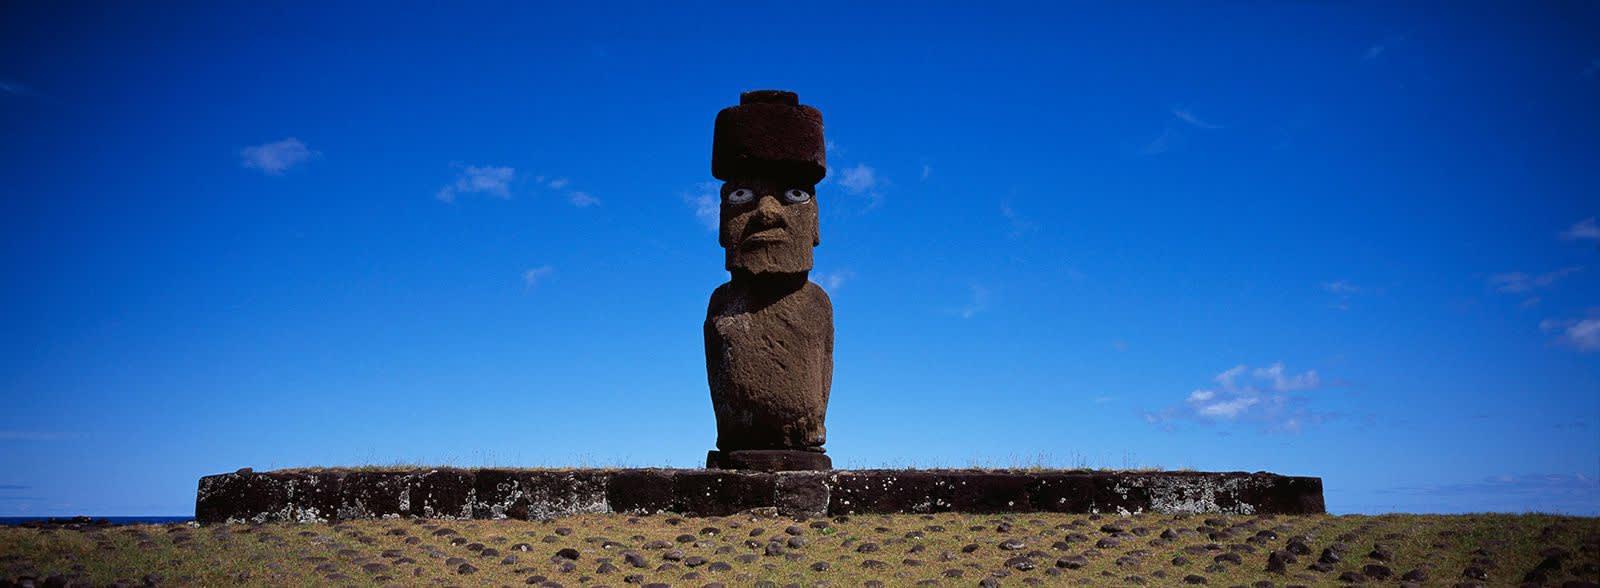 Matjaž Krivic, Easter Island, Chile, 2002 – 2006